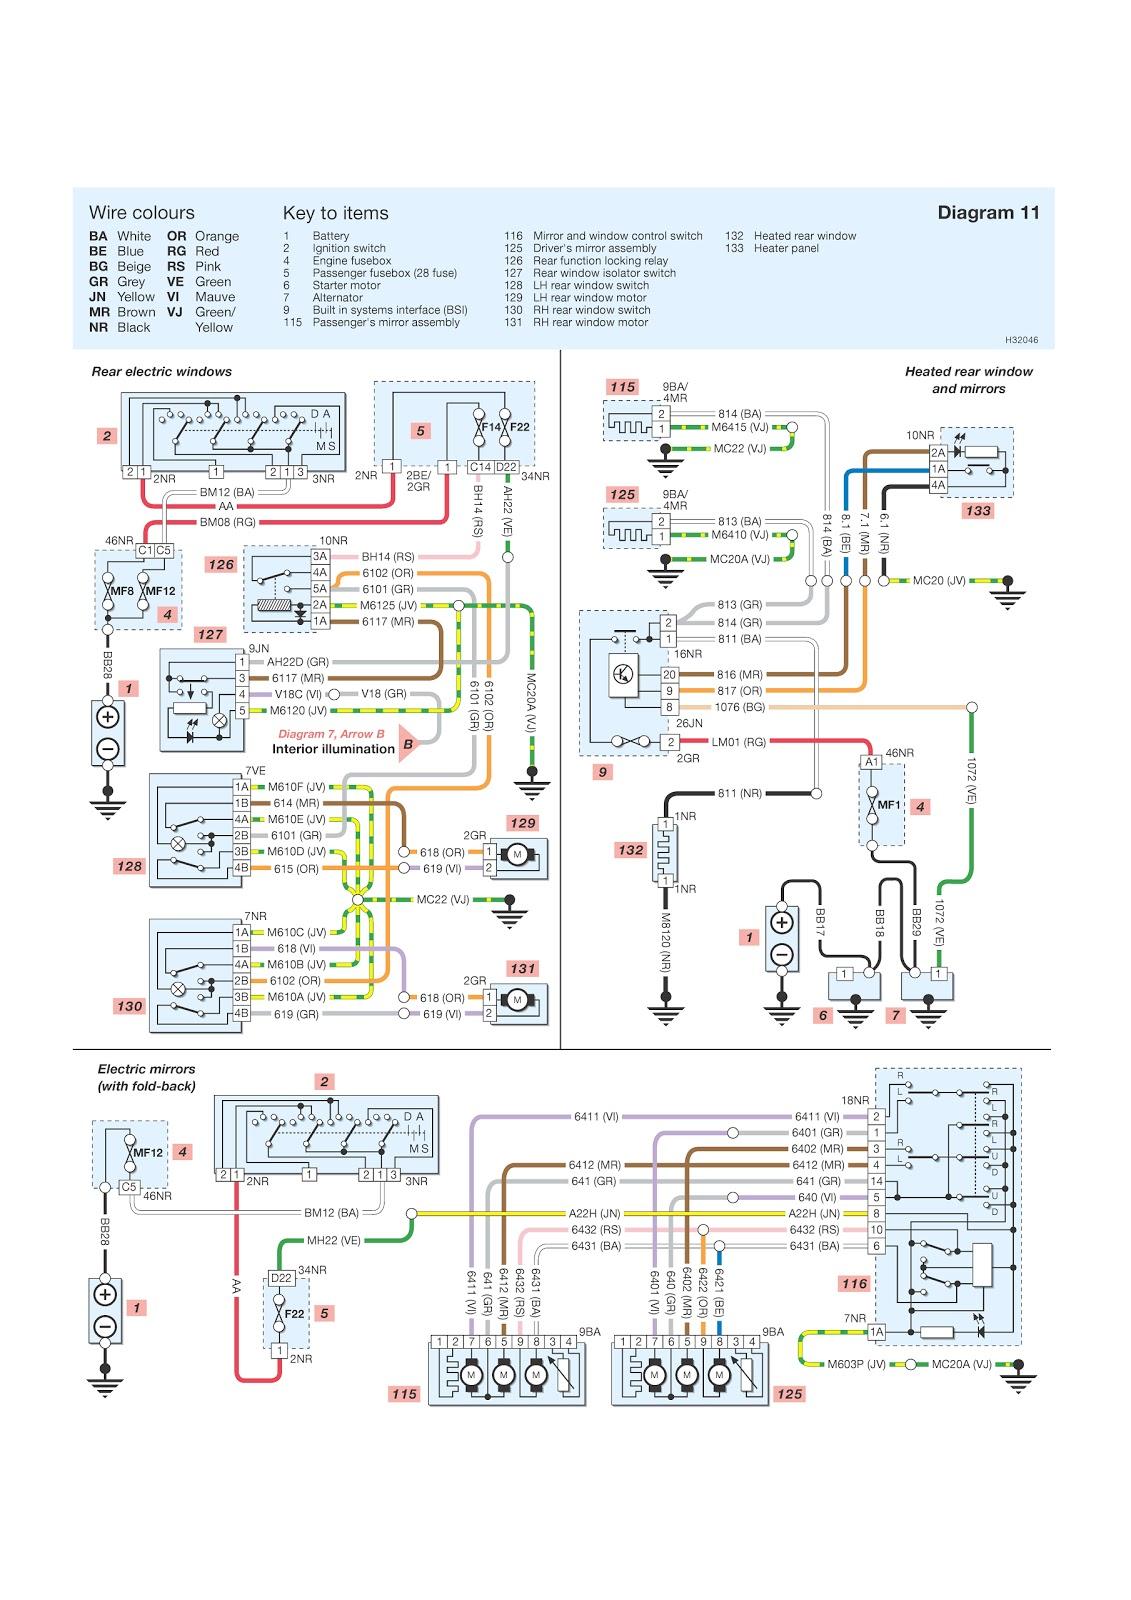 Chevy Astro Wiring Diagram Free Download Schematic Electrical 1998 Geo Tracker Van Diagrams 2003